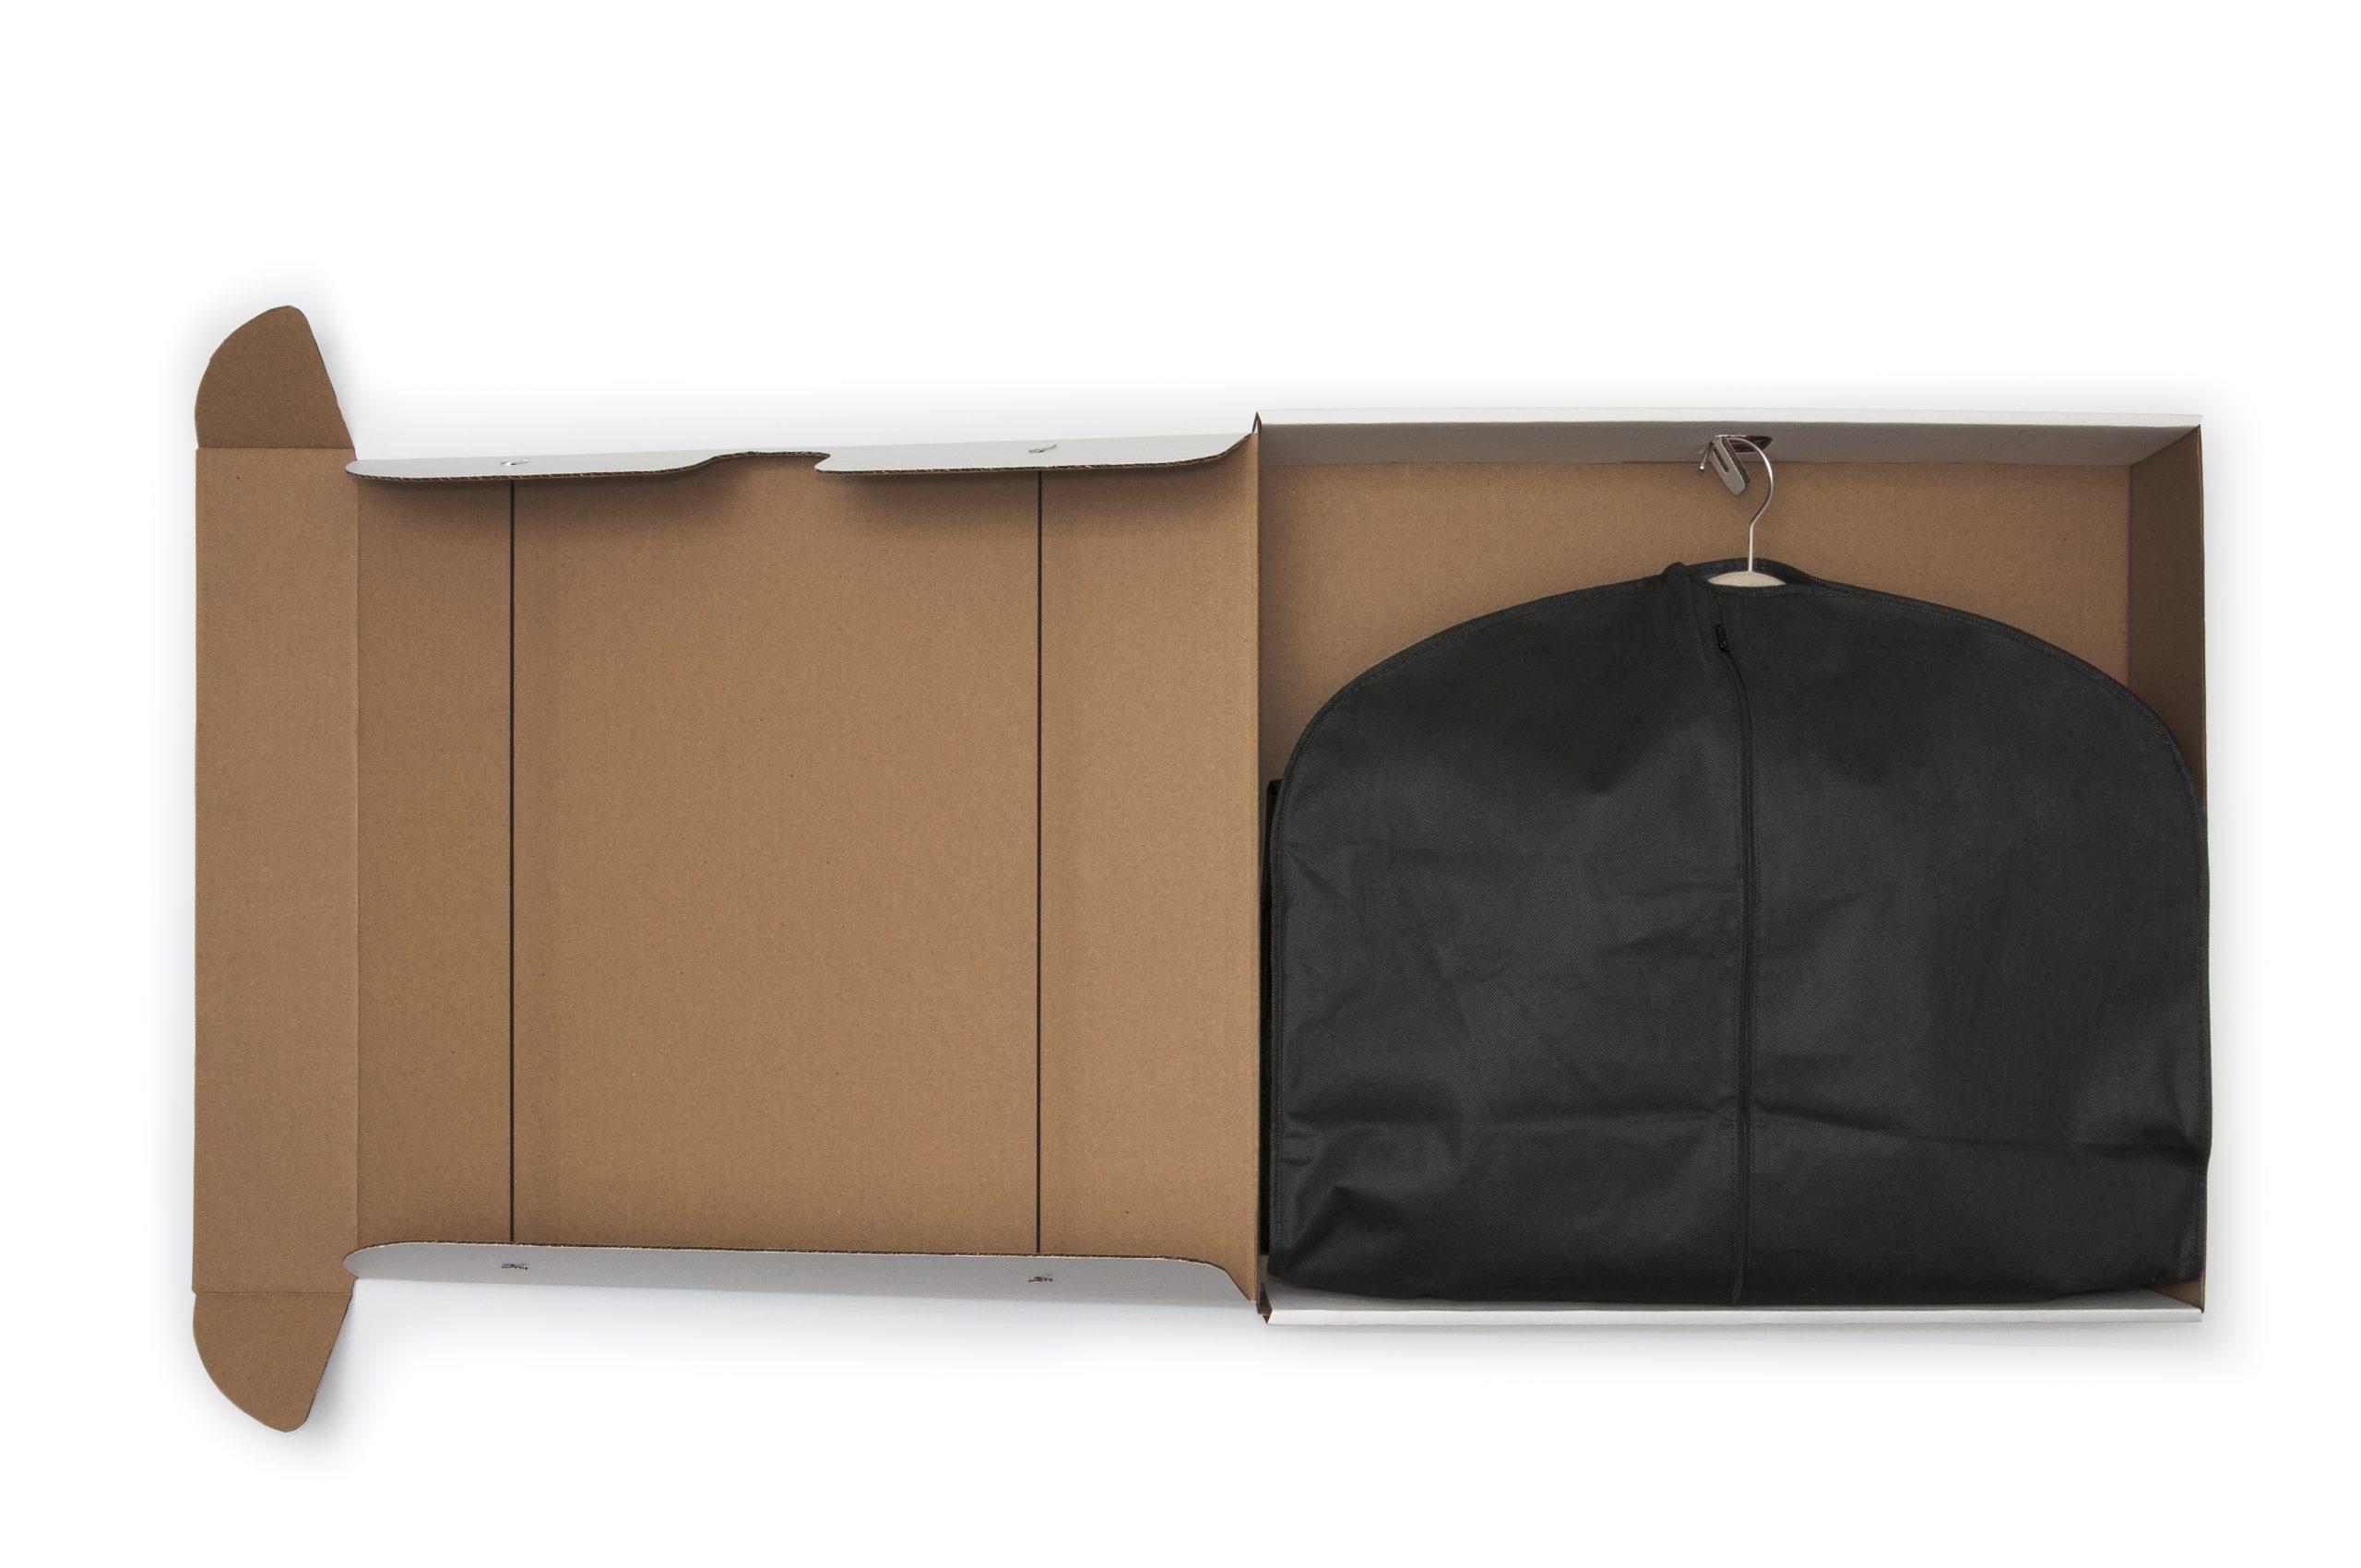 Bespoke Custom Packaging and Design